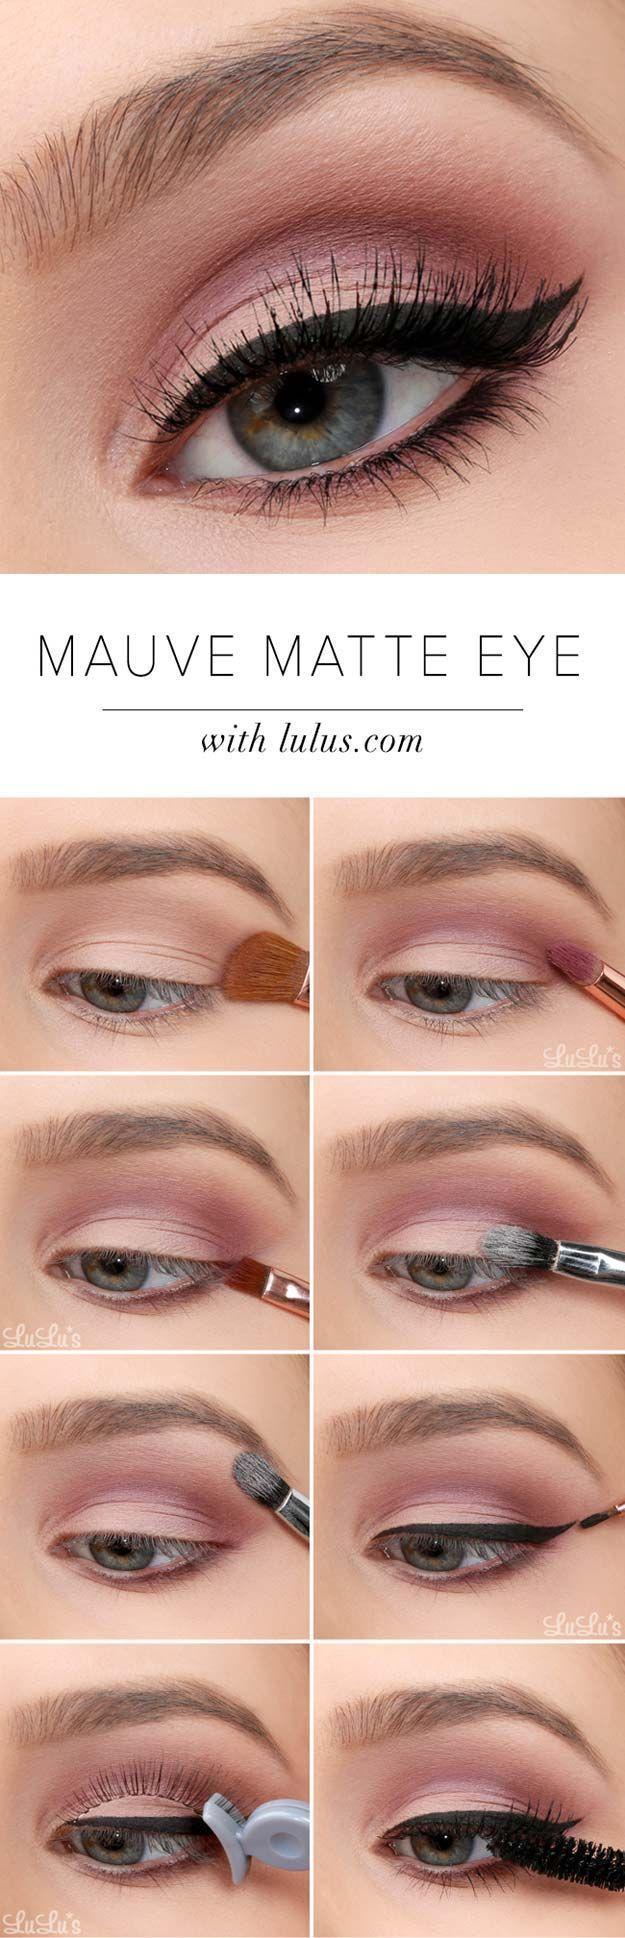 34 Sexy Eye Makeup Tutorials